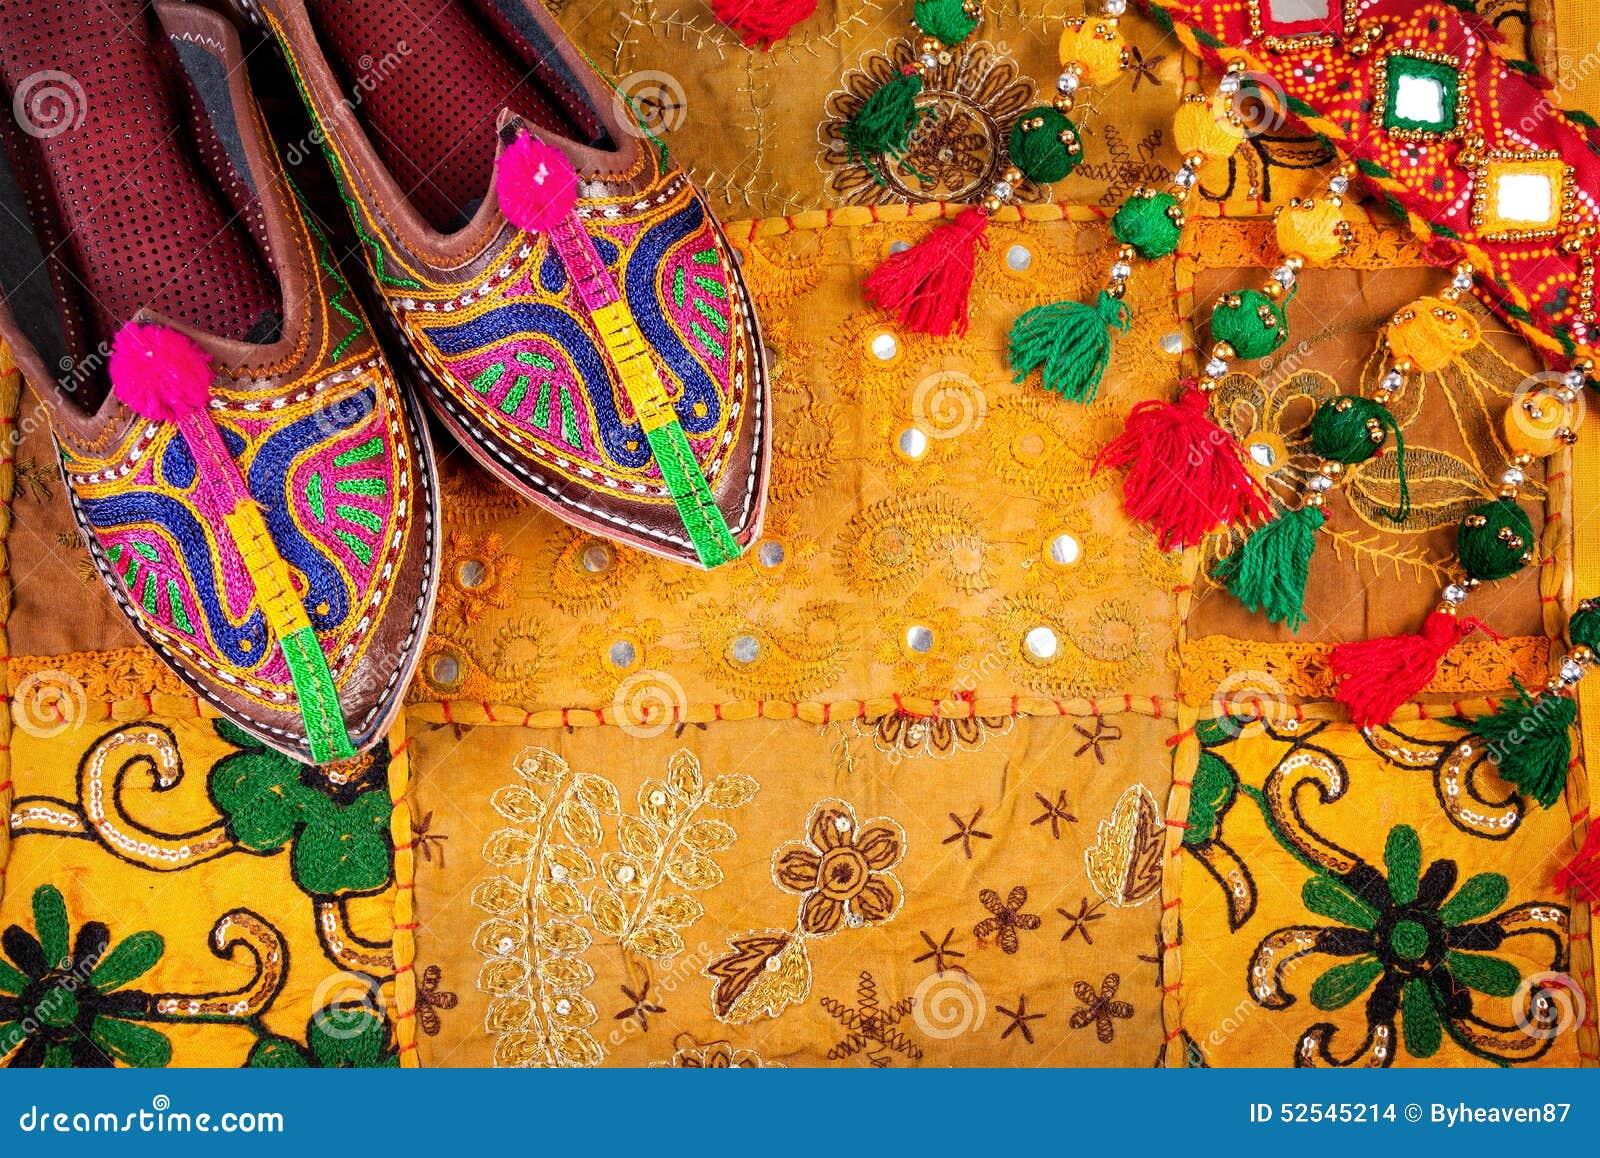 a9ac47d8d403 Τα ζωηρόχρωμες εθνικές παπούτσια και η ζώνη τσιγγάνων στο κίτρινο μαξιλάρι  του Rajasthan καλύπτουν παζαριών στην Ινδία